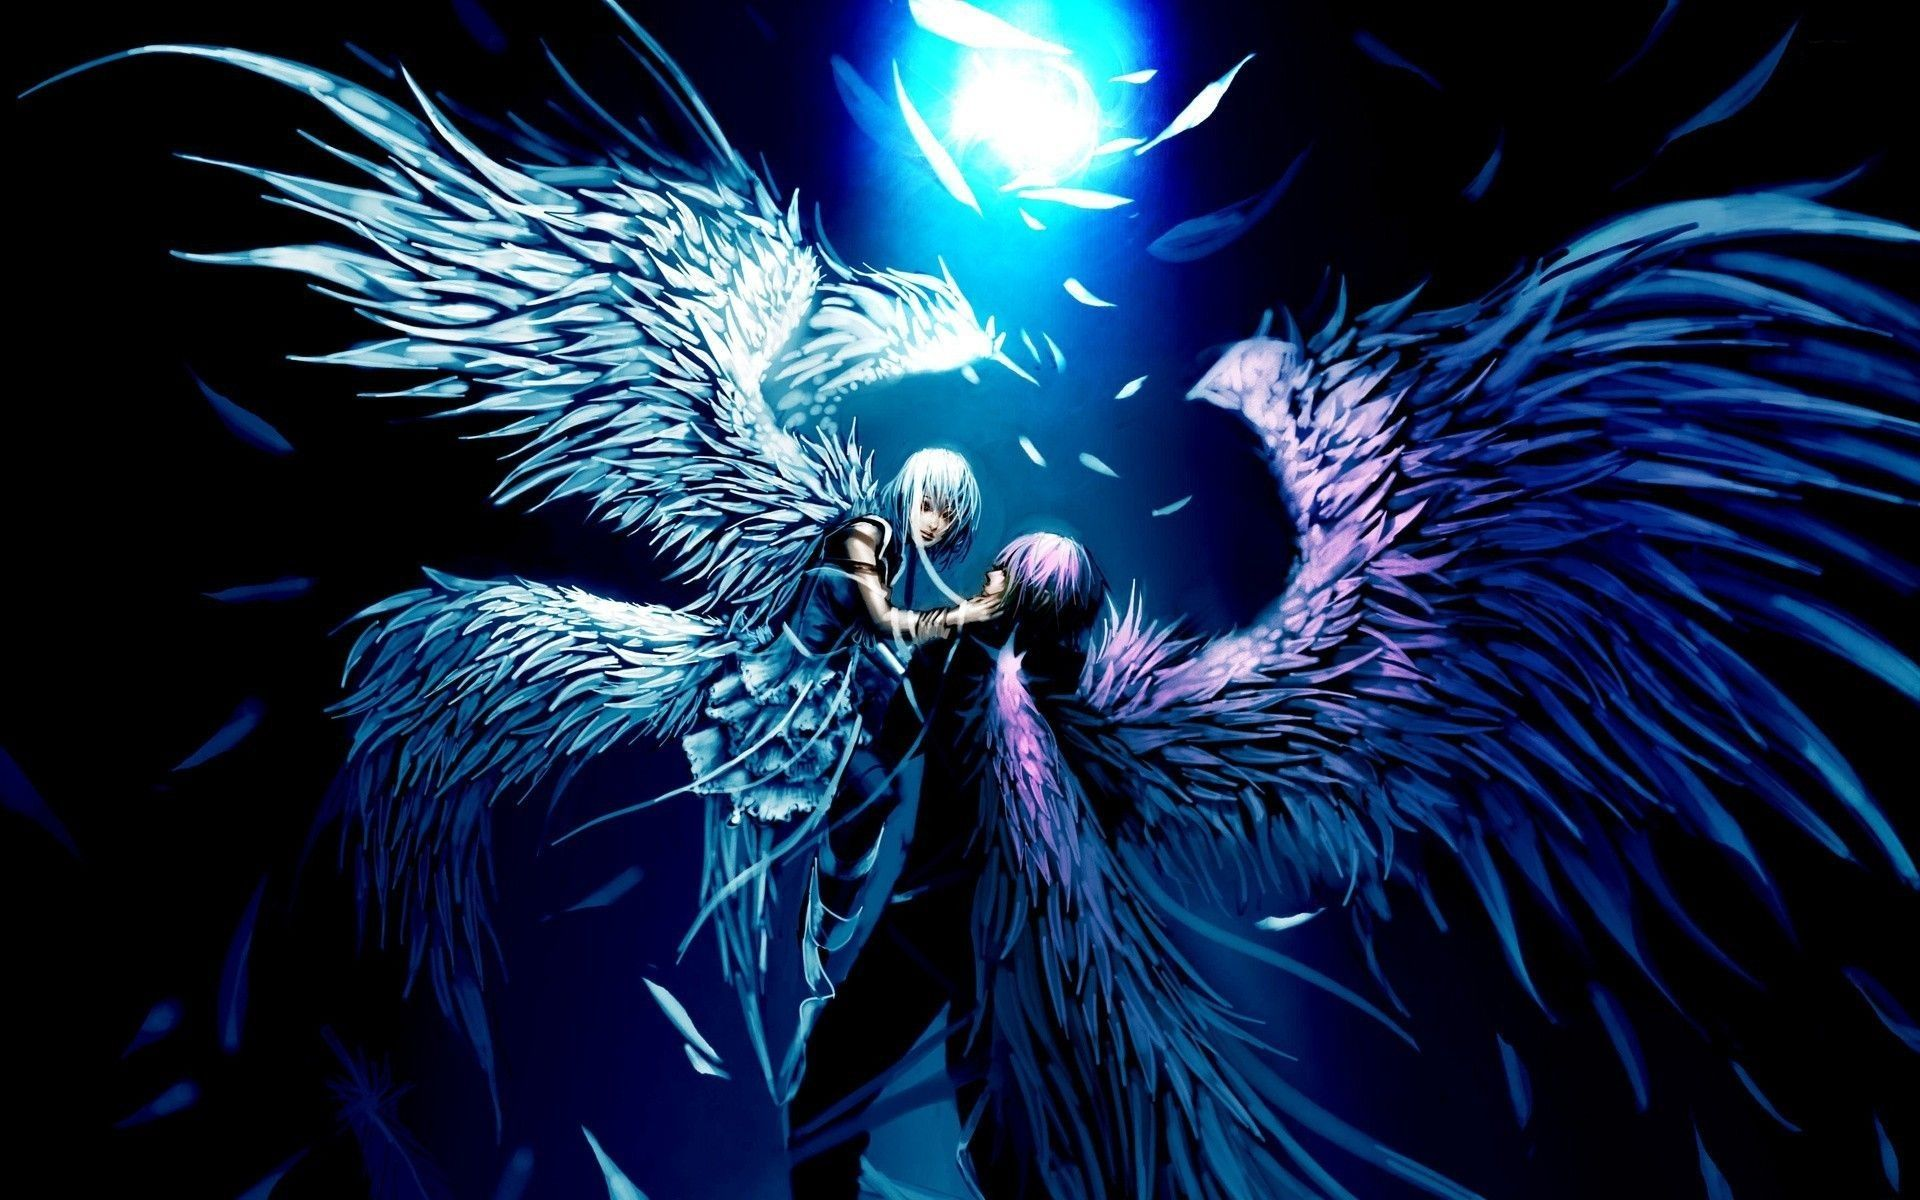 Image Result For Images Of Emo Backgrounds Angel Wallpaper Hd